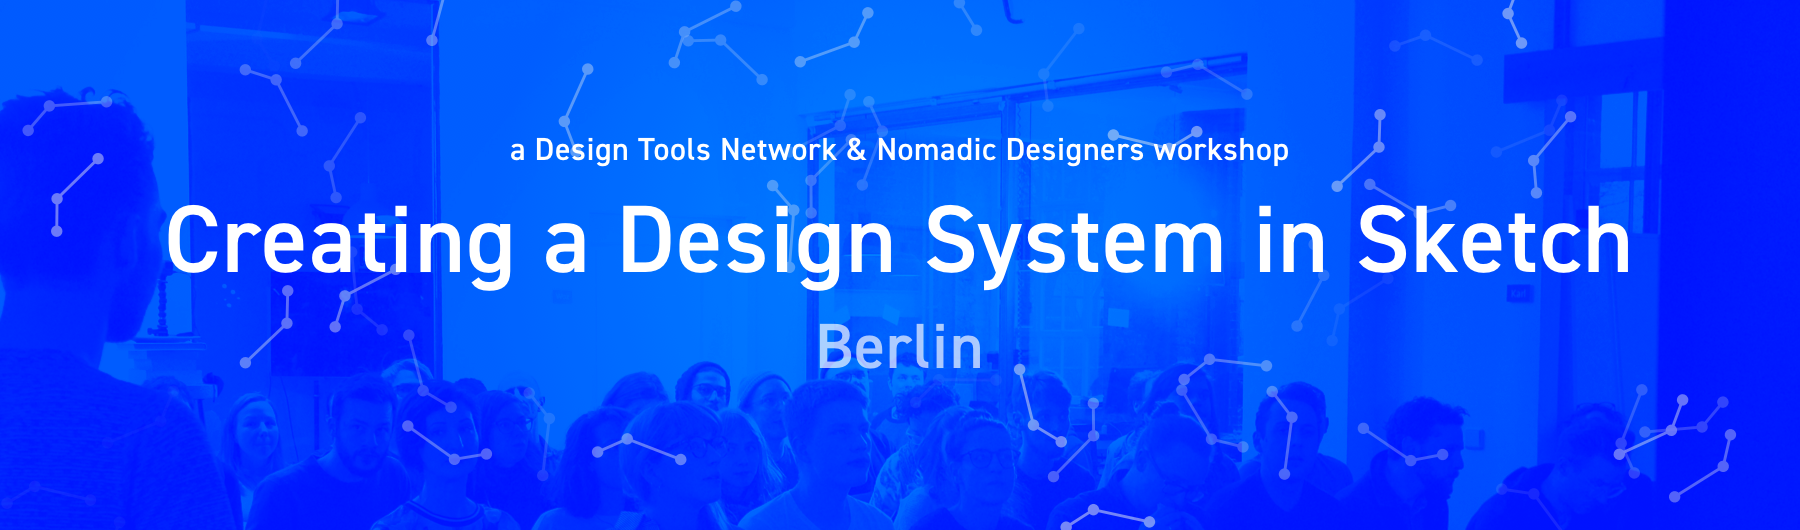 Workshop: Creating a Design System in Sketch (Berlin)